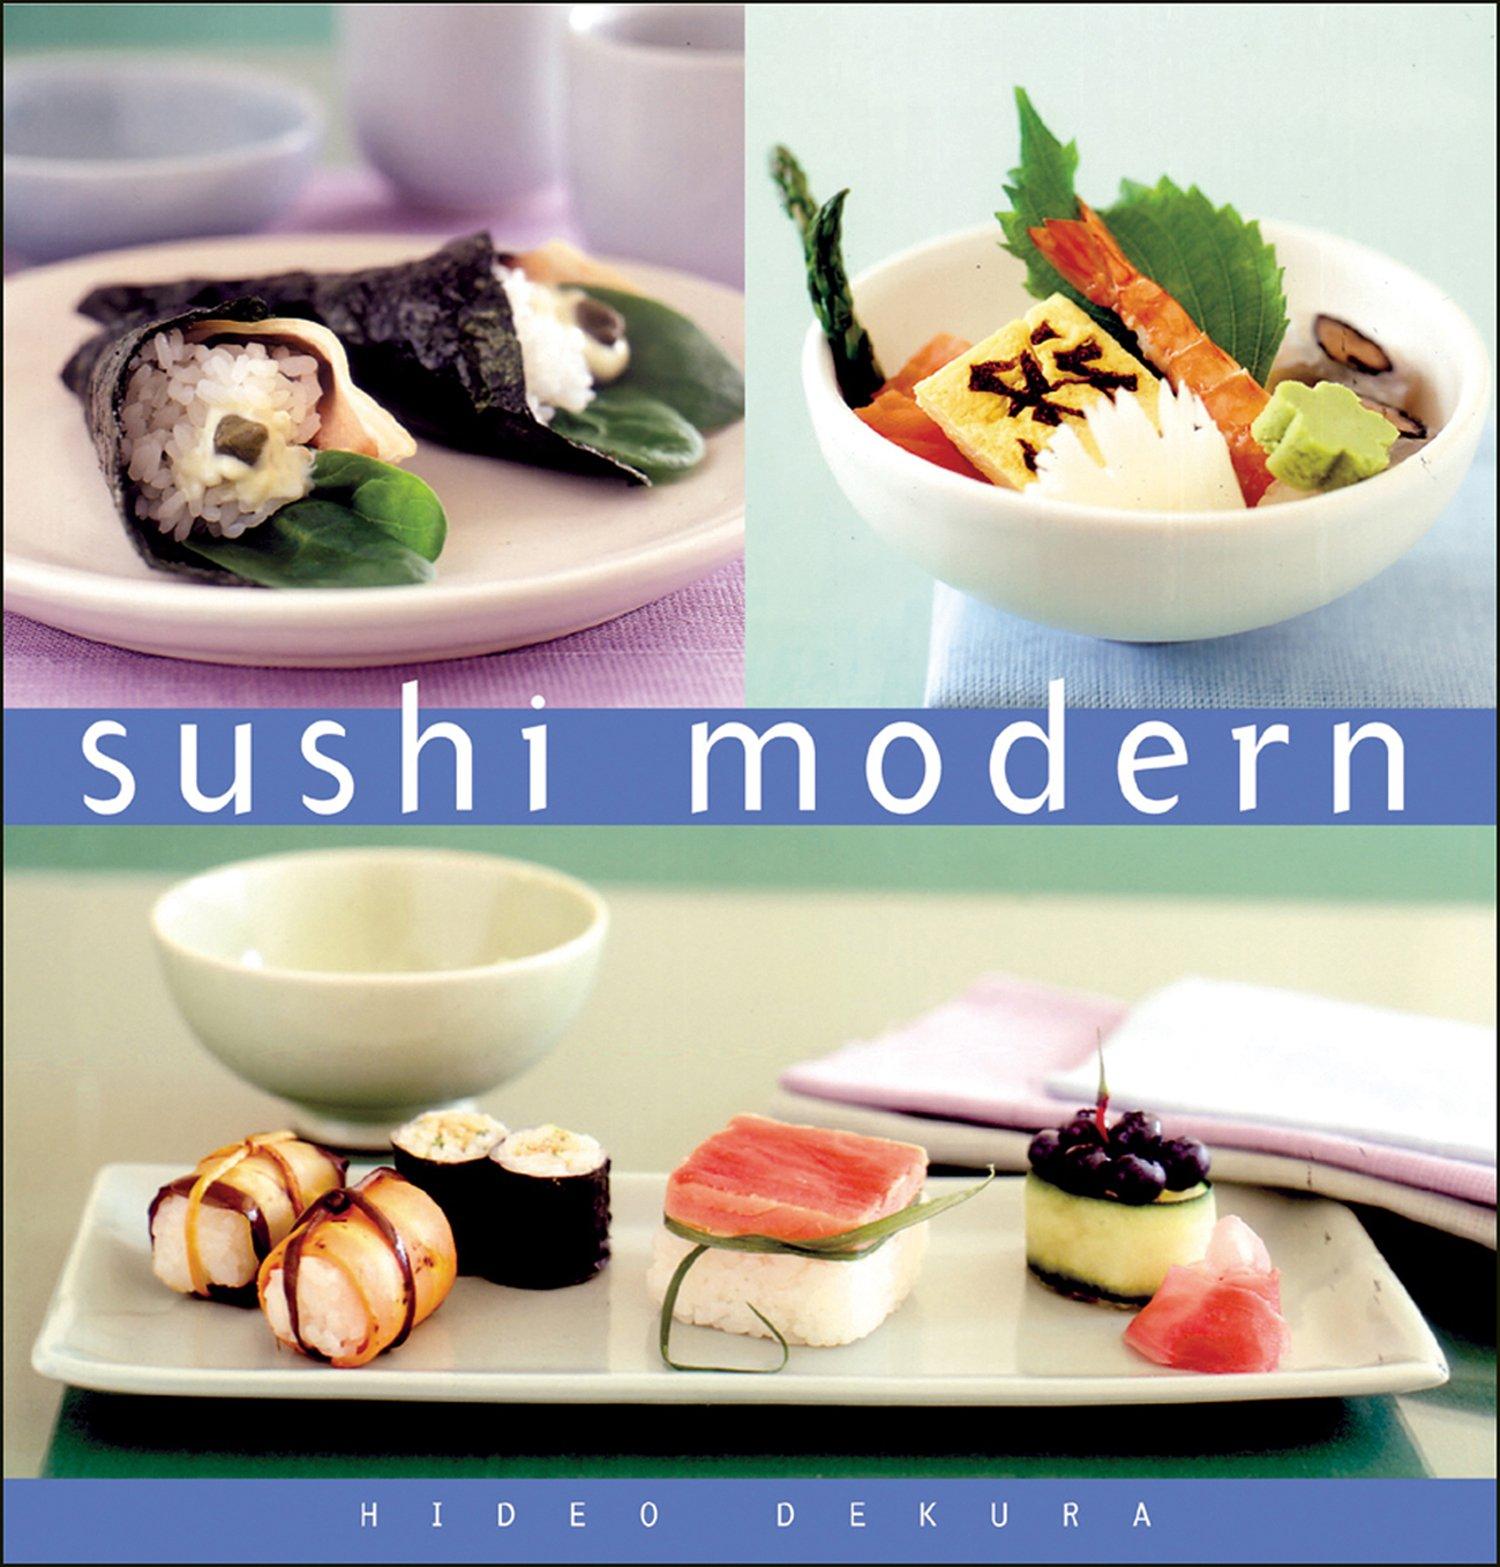 Sushi Modern Essential Kitchen Dekura product image